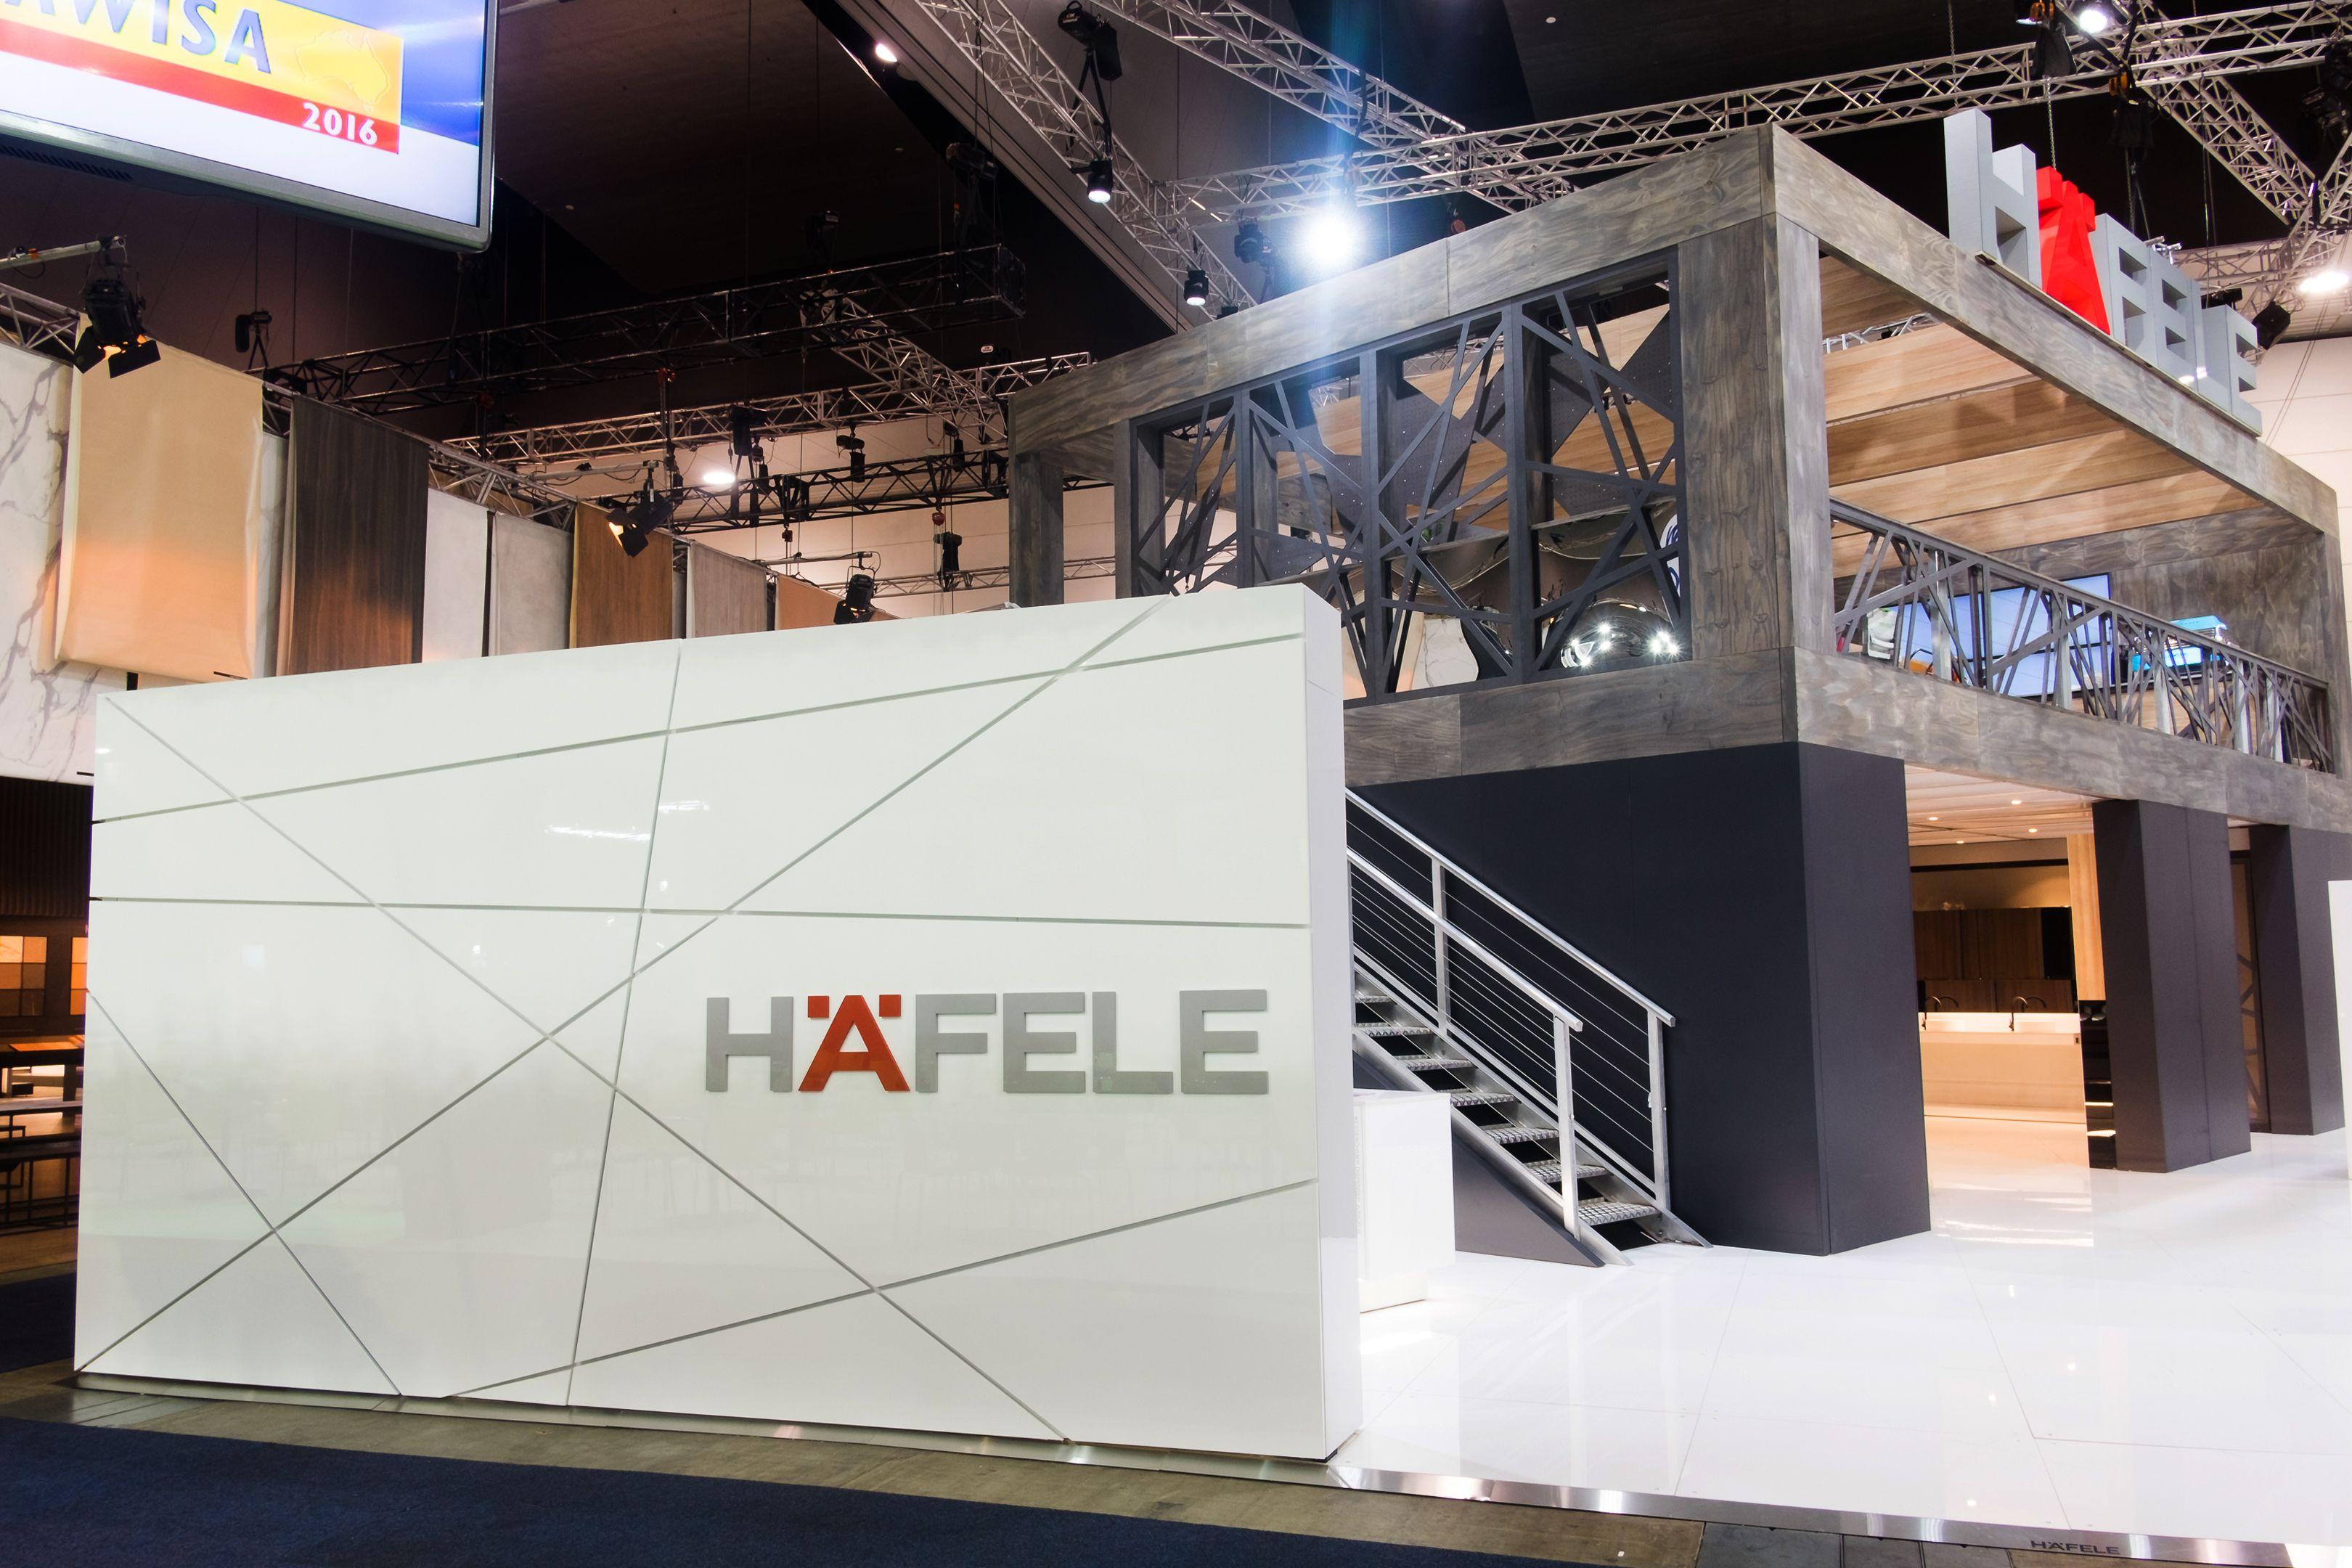 Expo Stands Australia : Hafele australia custom exhibition stand @ awisa 2016 melbourne